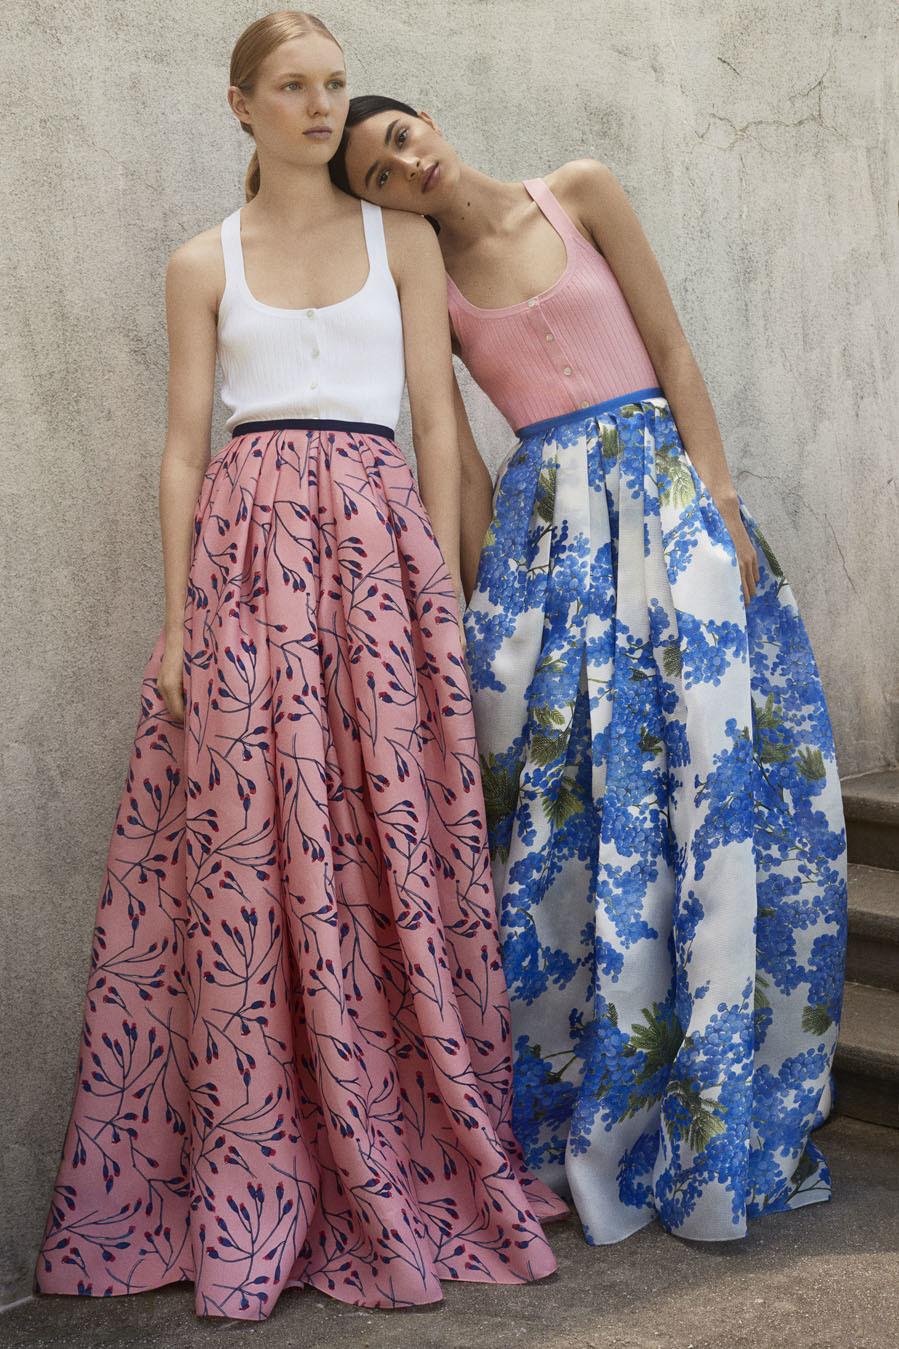 ed4e3a5405b Colección Resort 2018 de Carolina Herrera: faldas estampadas ...